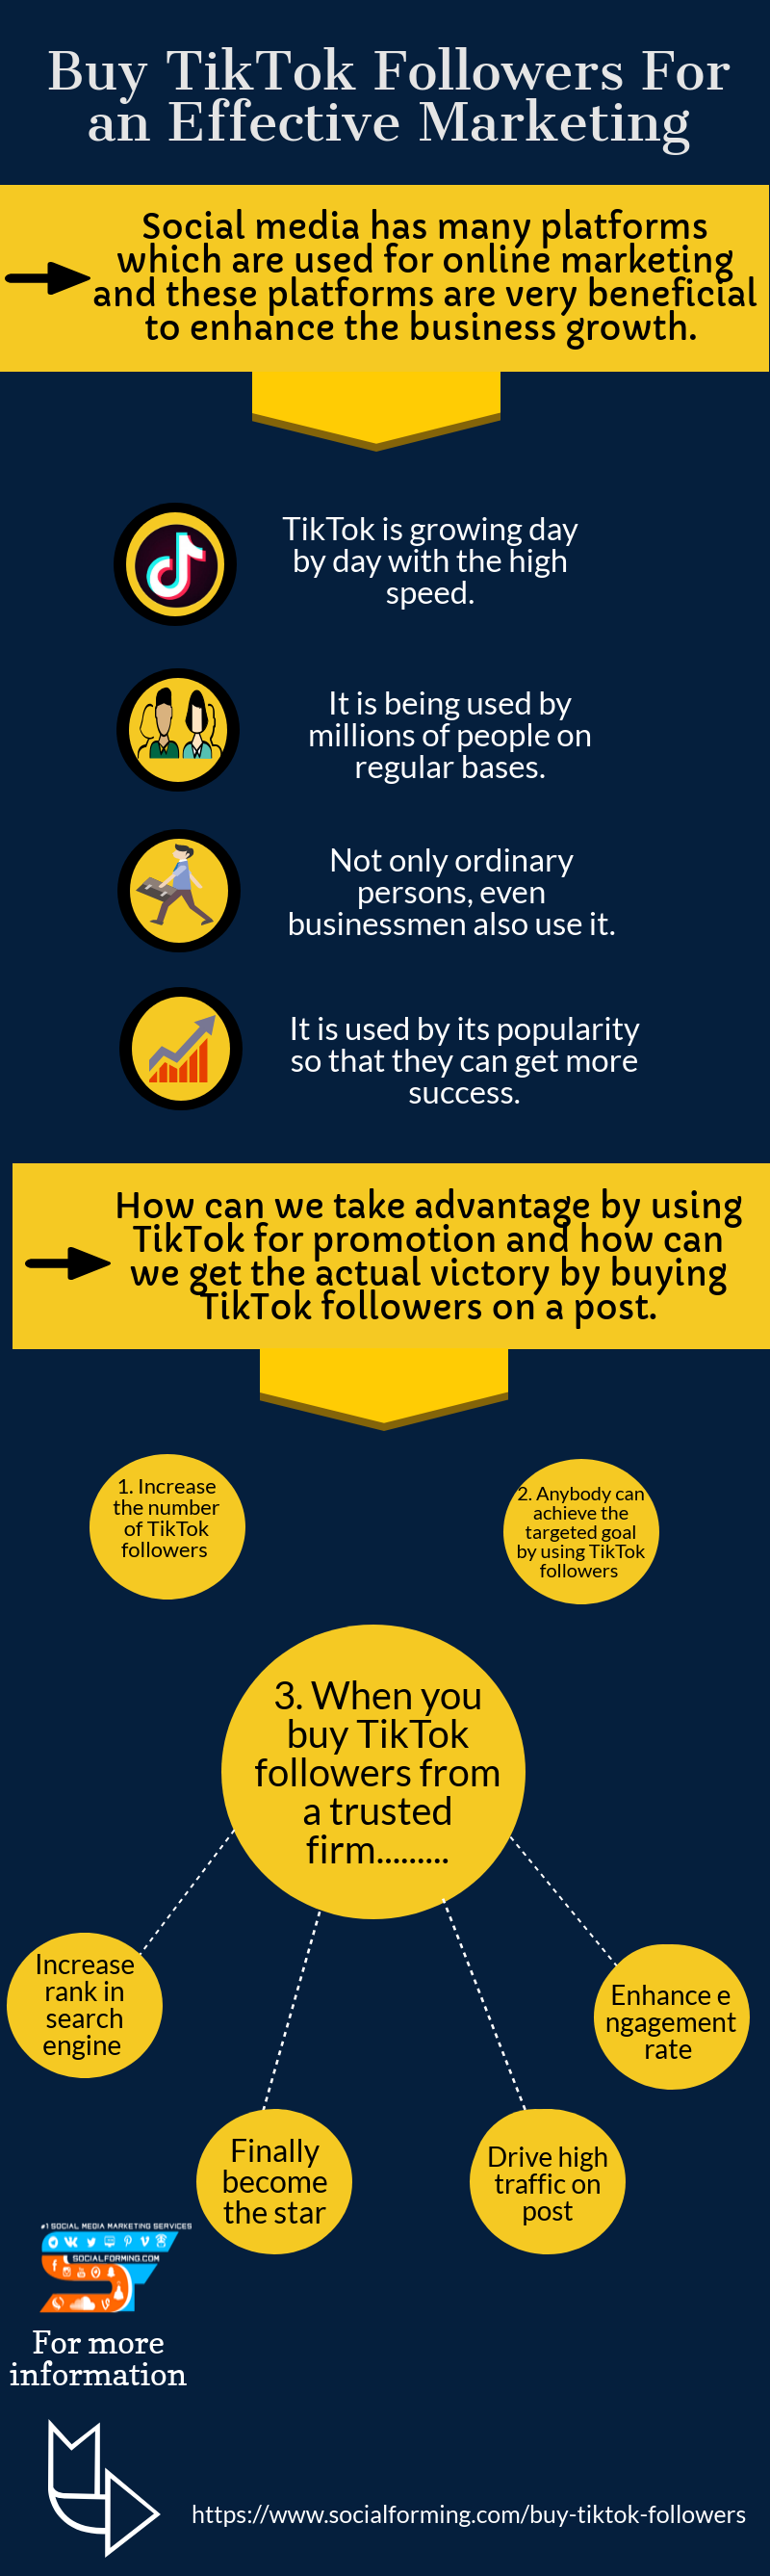 How Do You Get Famous On Tiktok Social Media Marketing Services Instagram Marketing Marketing Services